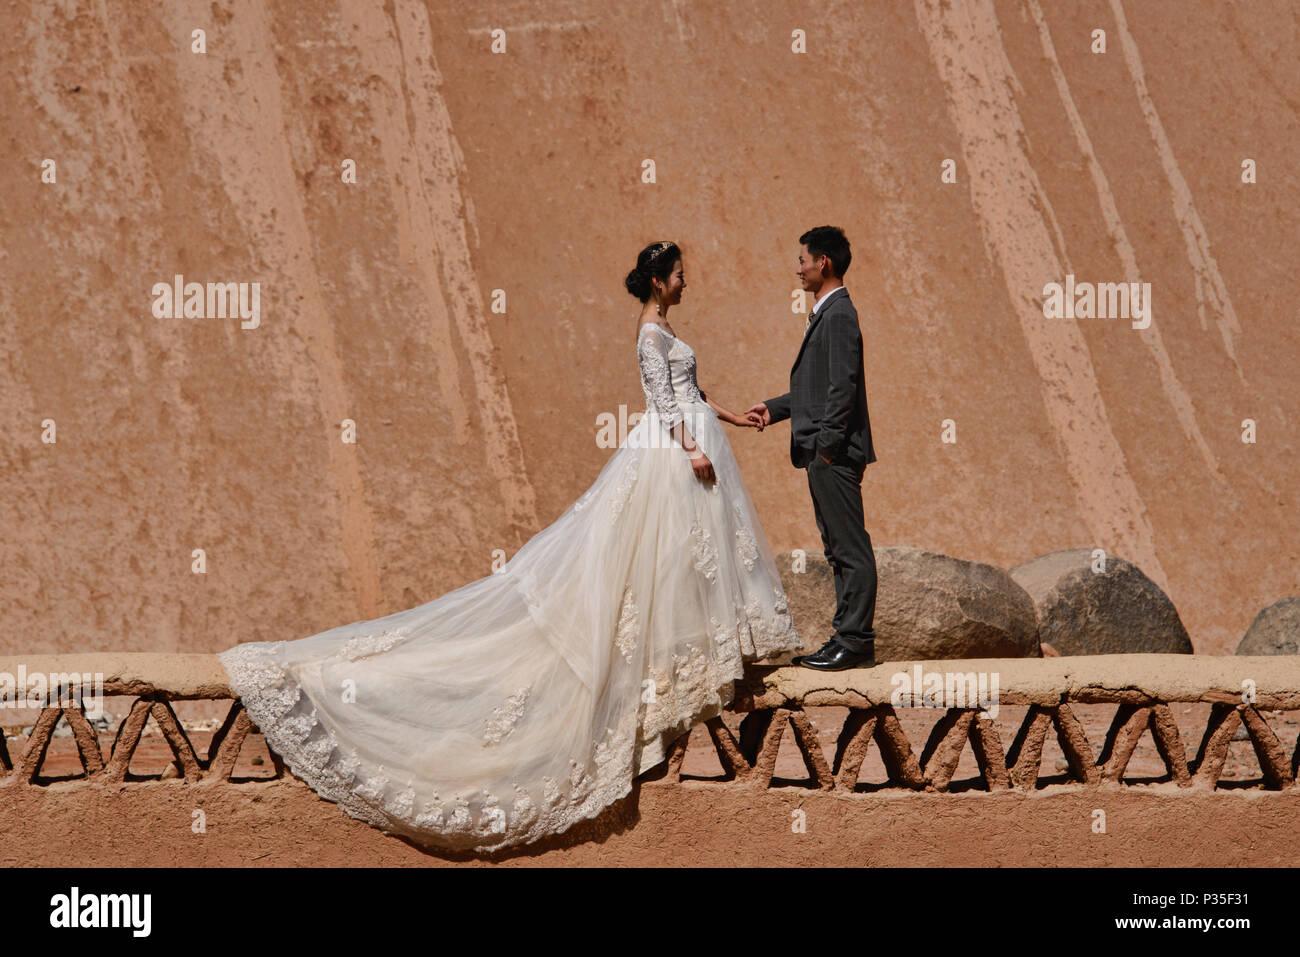 Getting married in the Flaming Mountains, Turpan, Xinjiang, China - Stock Image